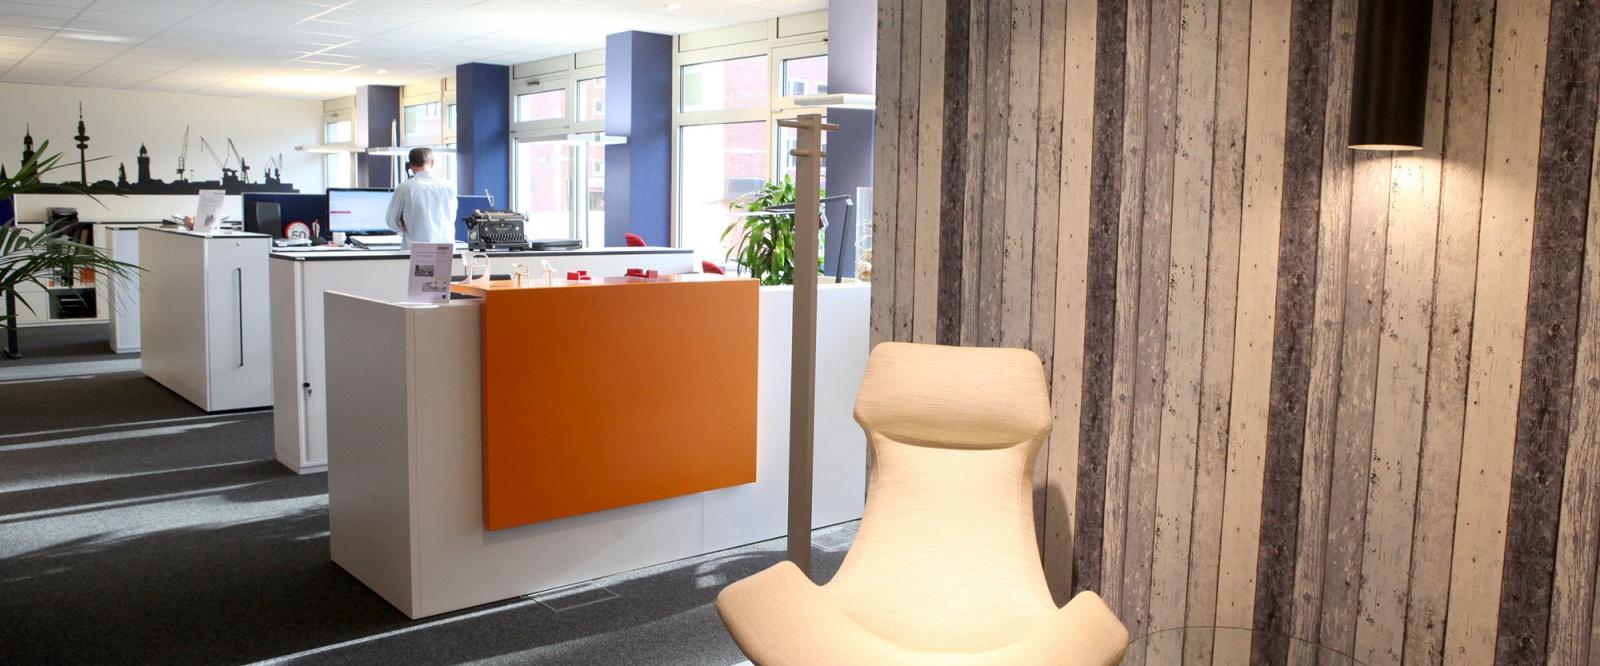 Büromöbelausstellung Hamburg,Showroom Heidenkampsweg,Broders&Knigge   BK